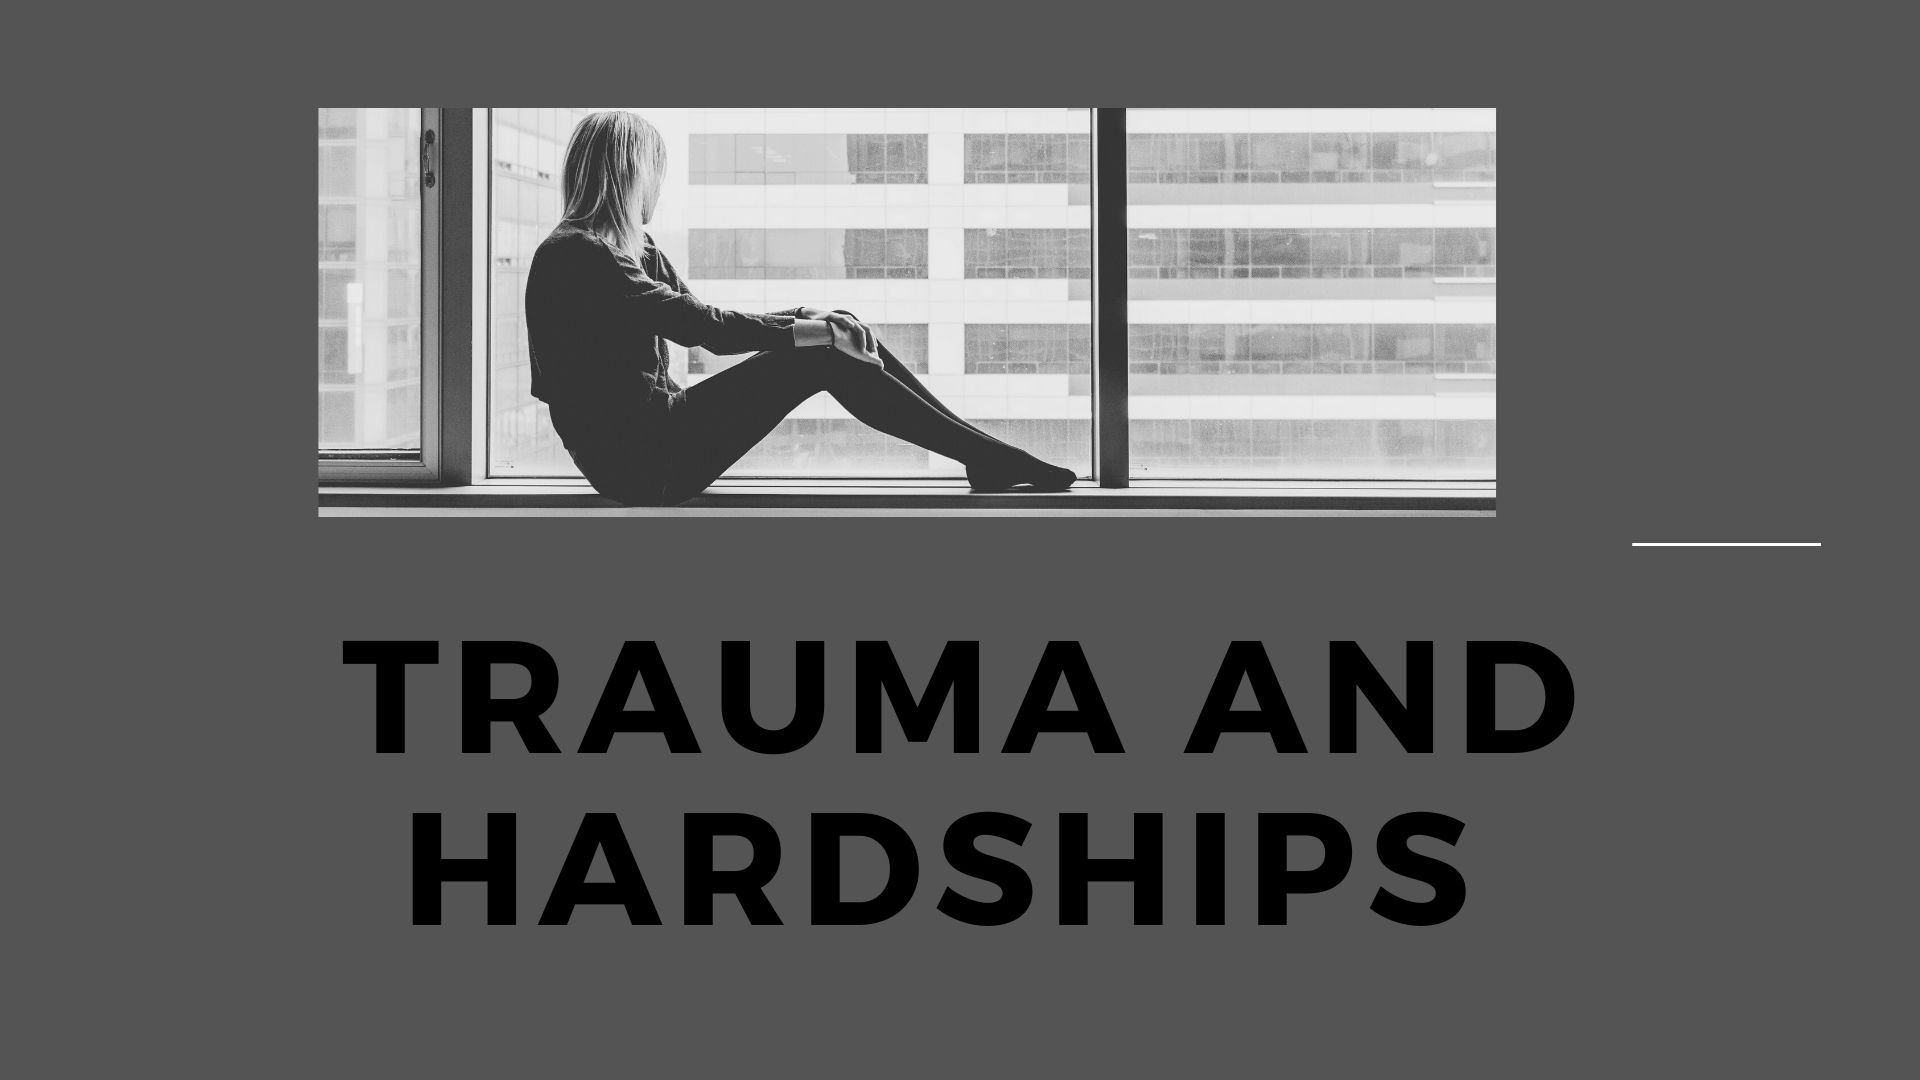 Trauma and Hardships